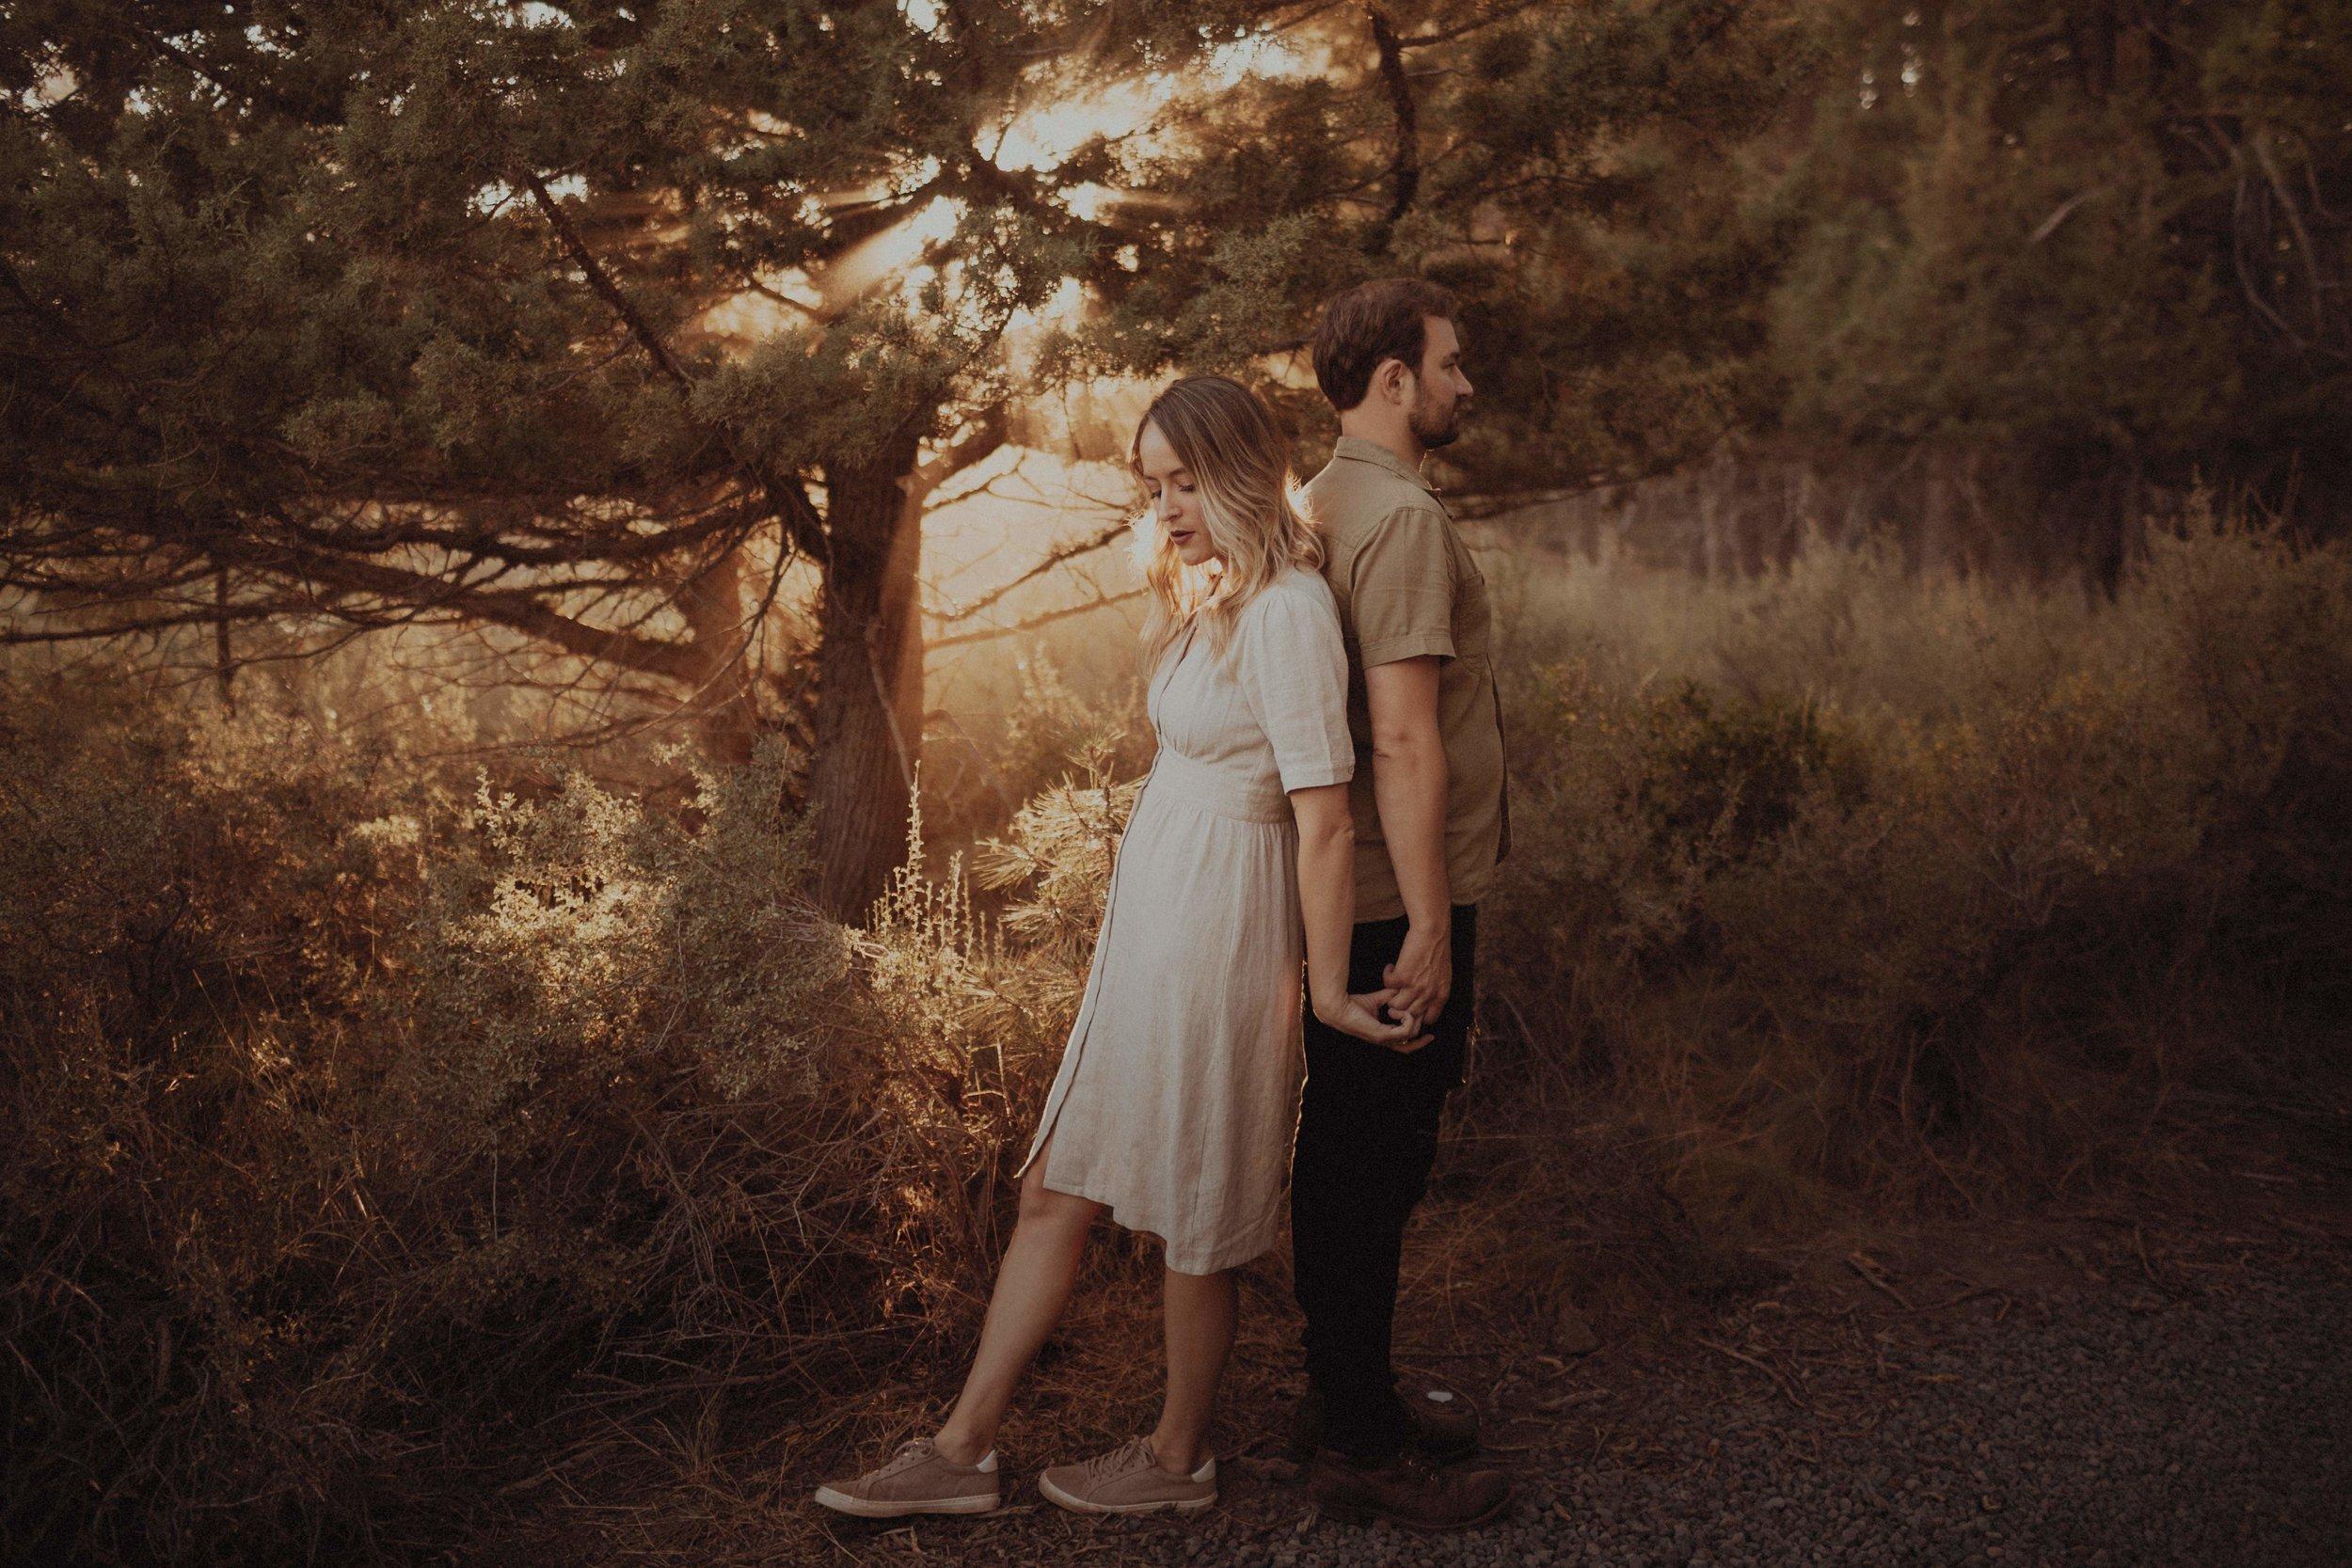 Dillon Falls Couple Shoot.Lauren Apel Photo26.JPG